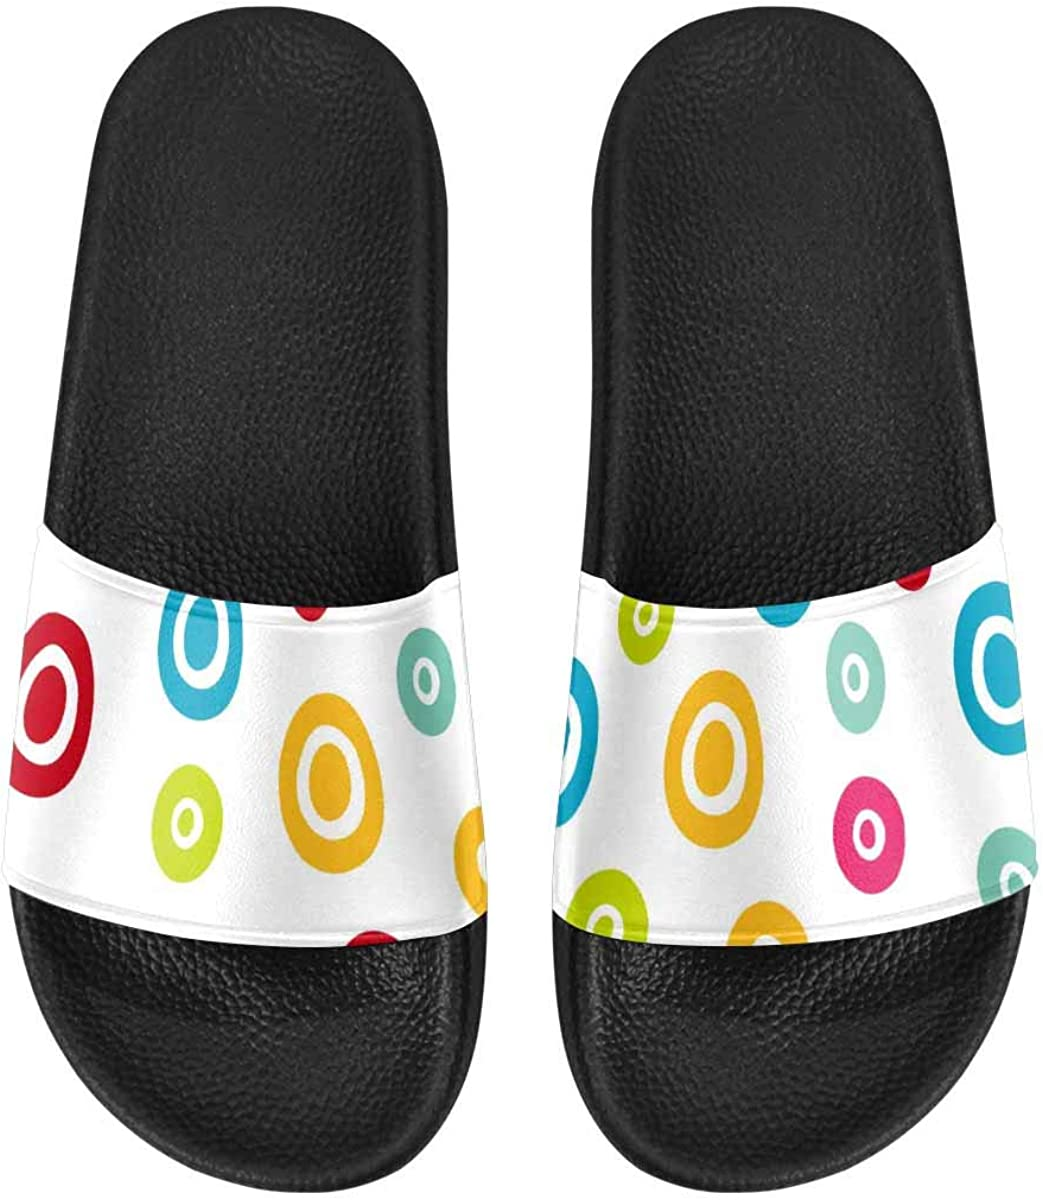 InterestPrint Women's Casual and Lightweight Slipper Sandals for Home Carpet Border Frame Pattern